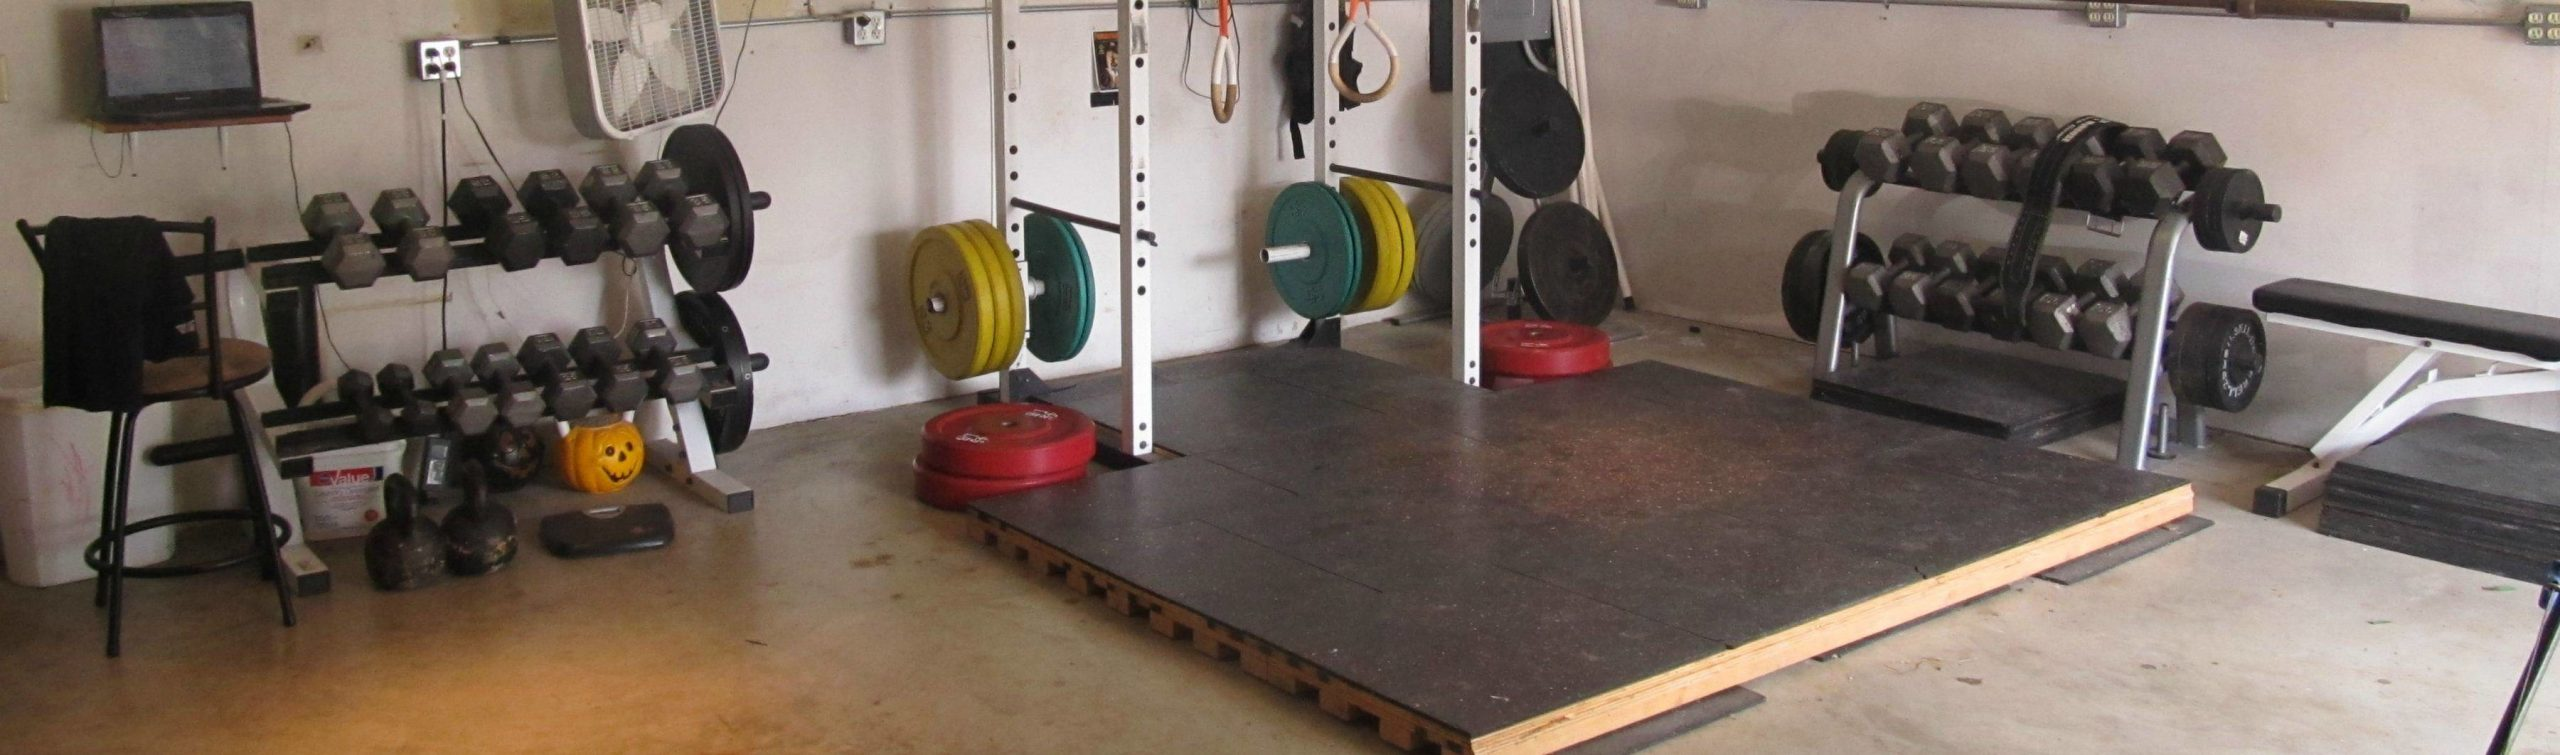 Garage Gym Flooring Uk Solutions, Level Garage Floor For Gym